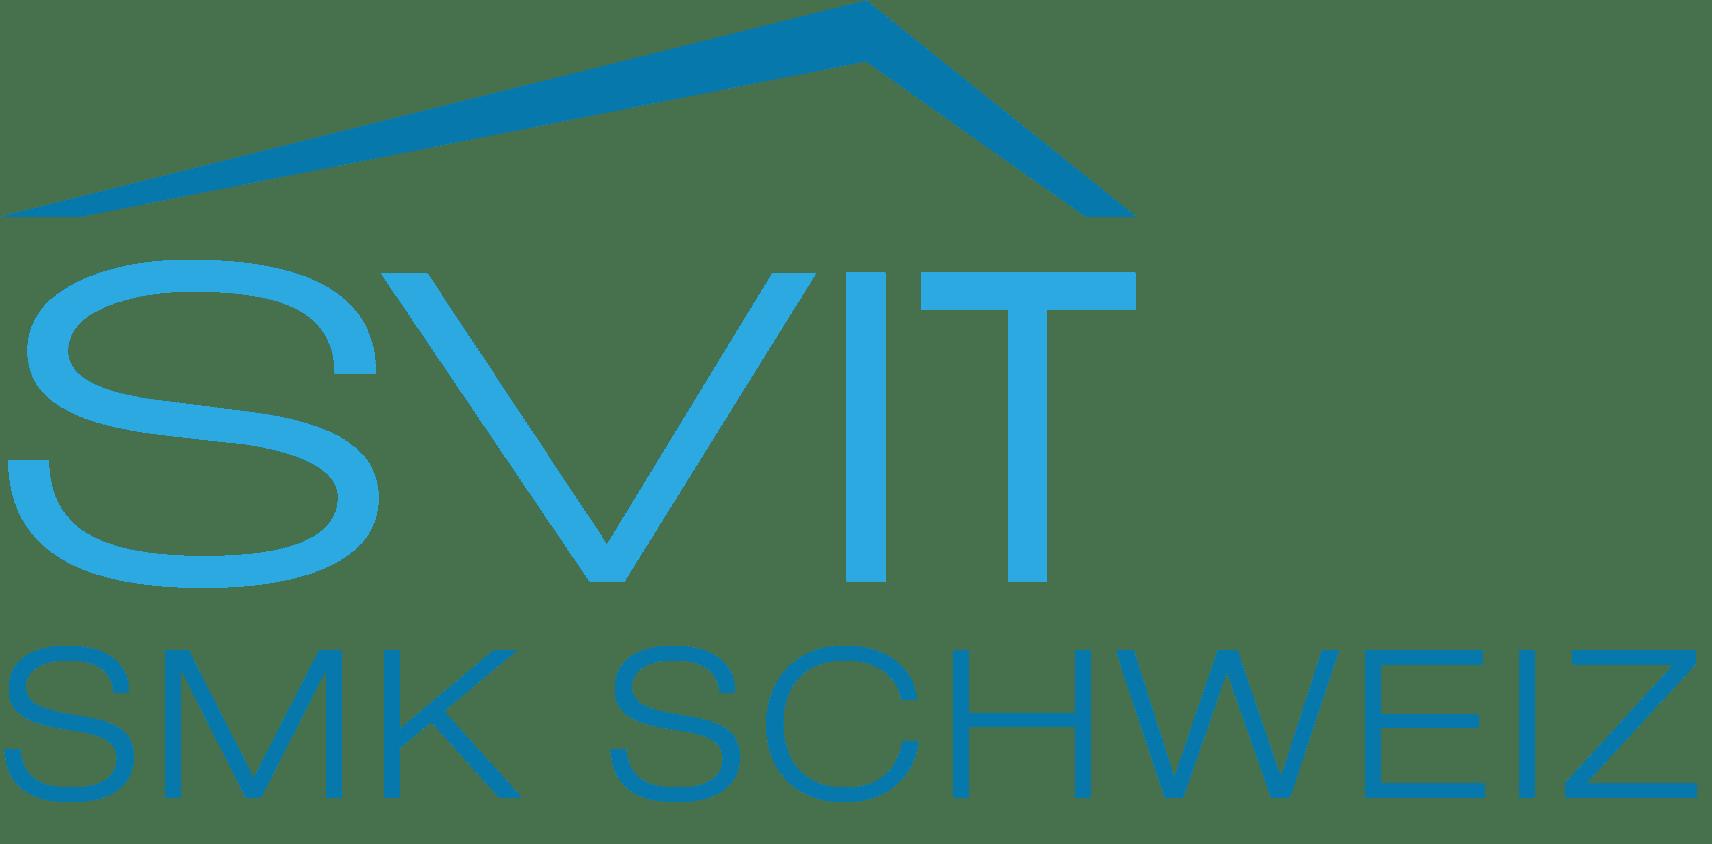 SVIT Logo SMK farbig min